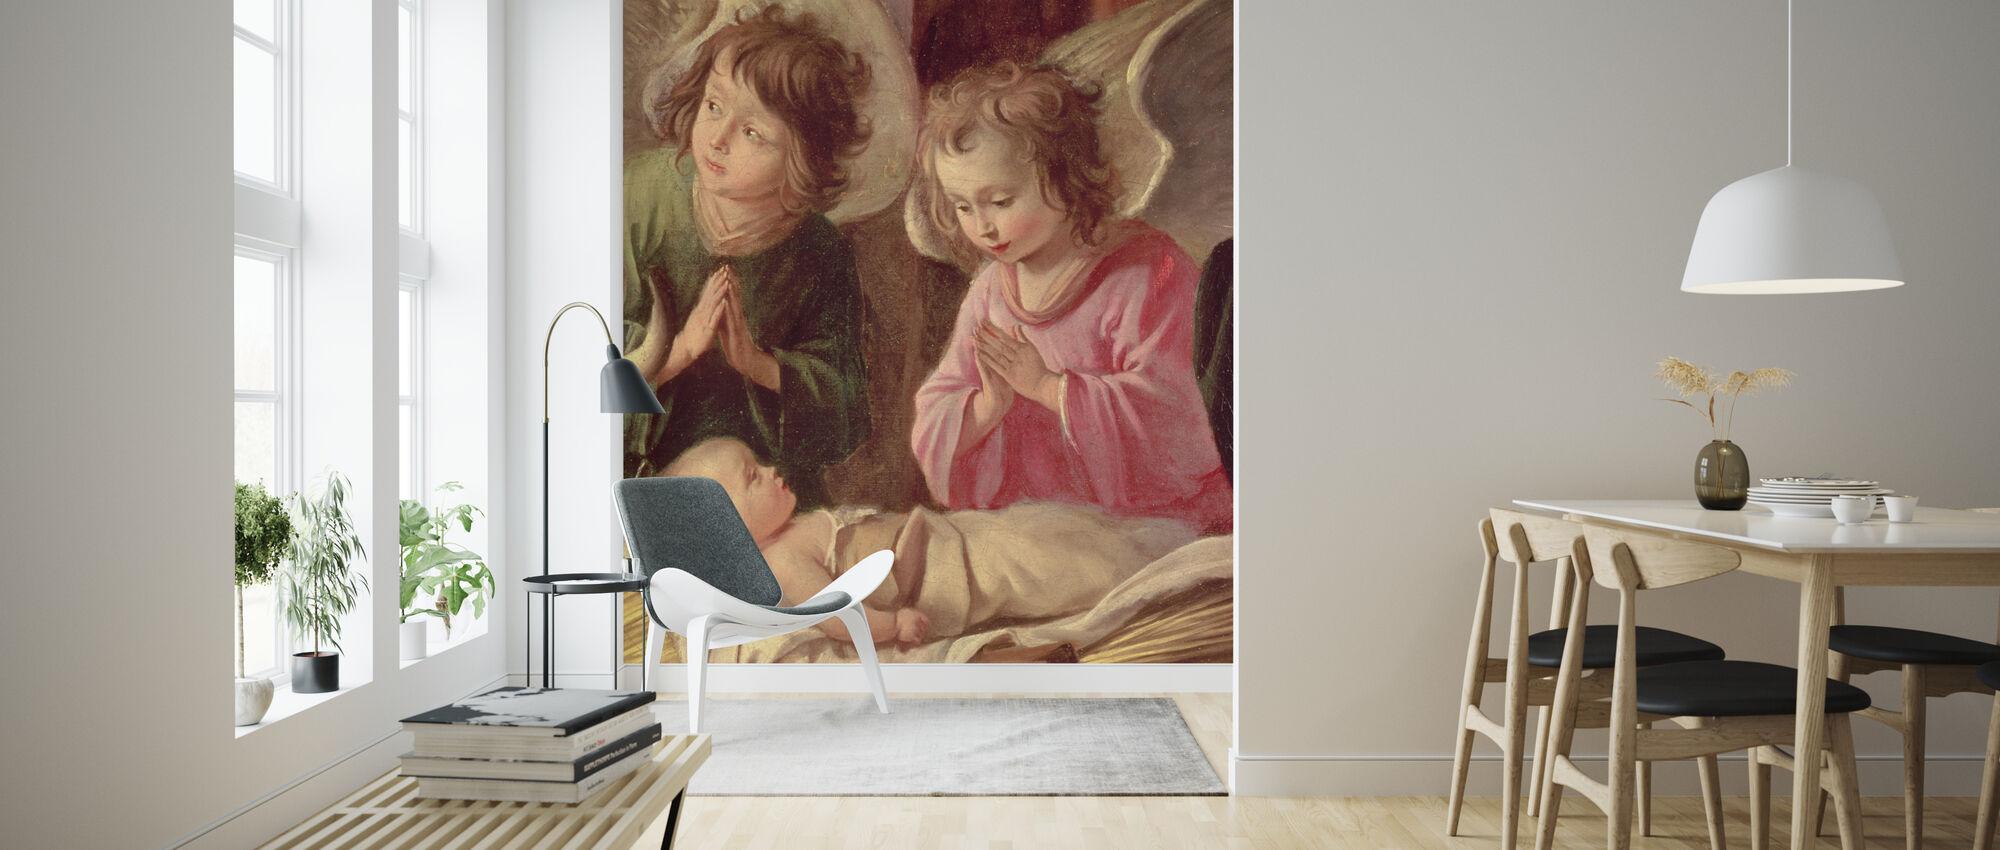 Adoration of the Shepherds - Antoine Le Nain - Wallpaper - Living Room